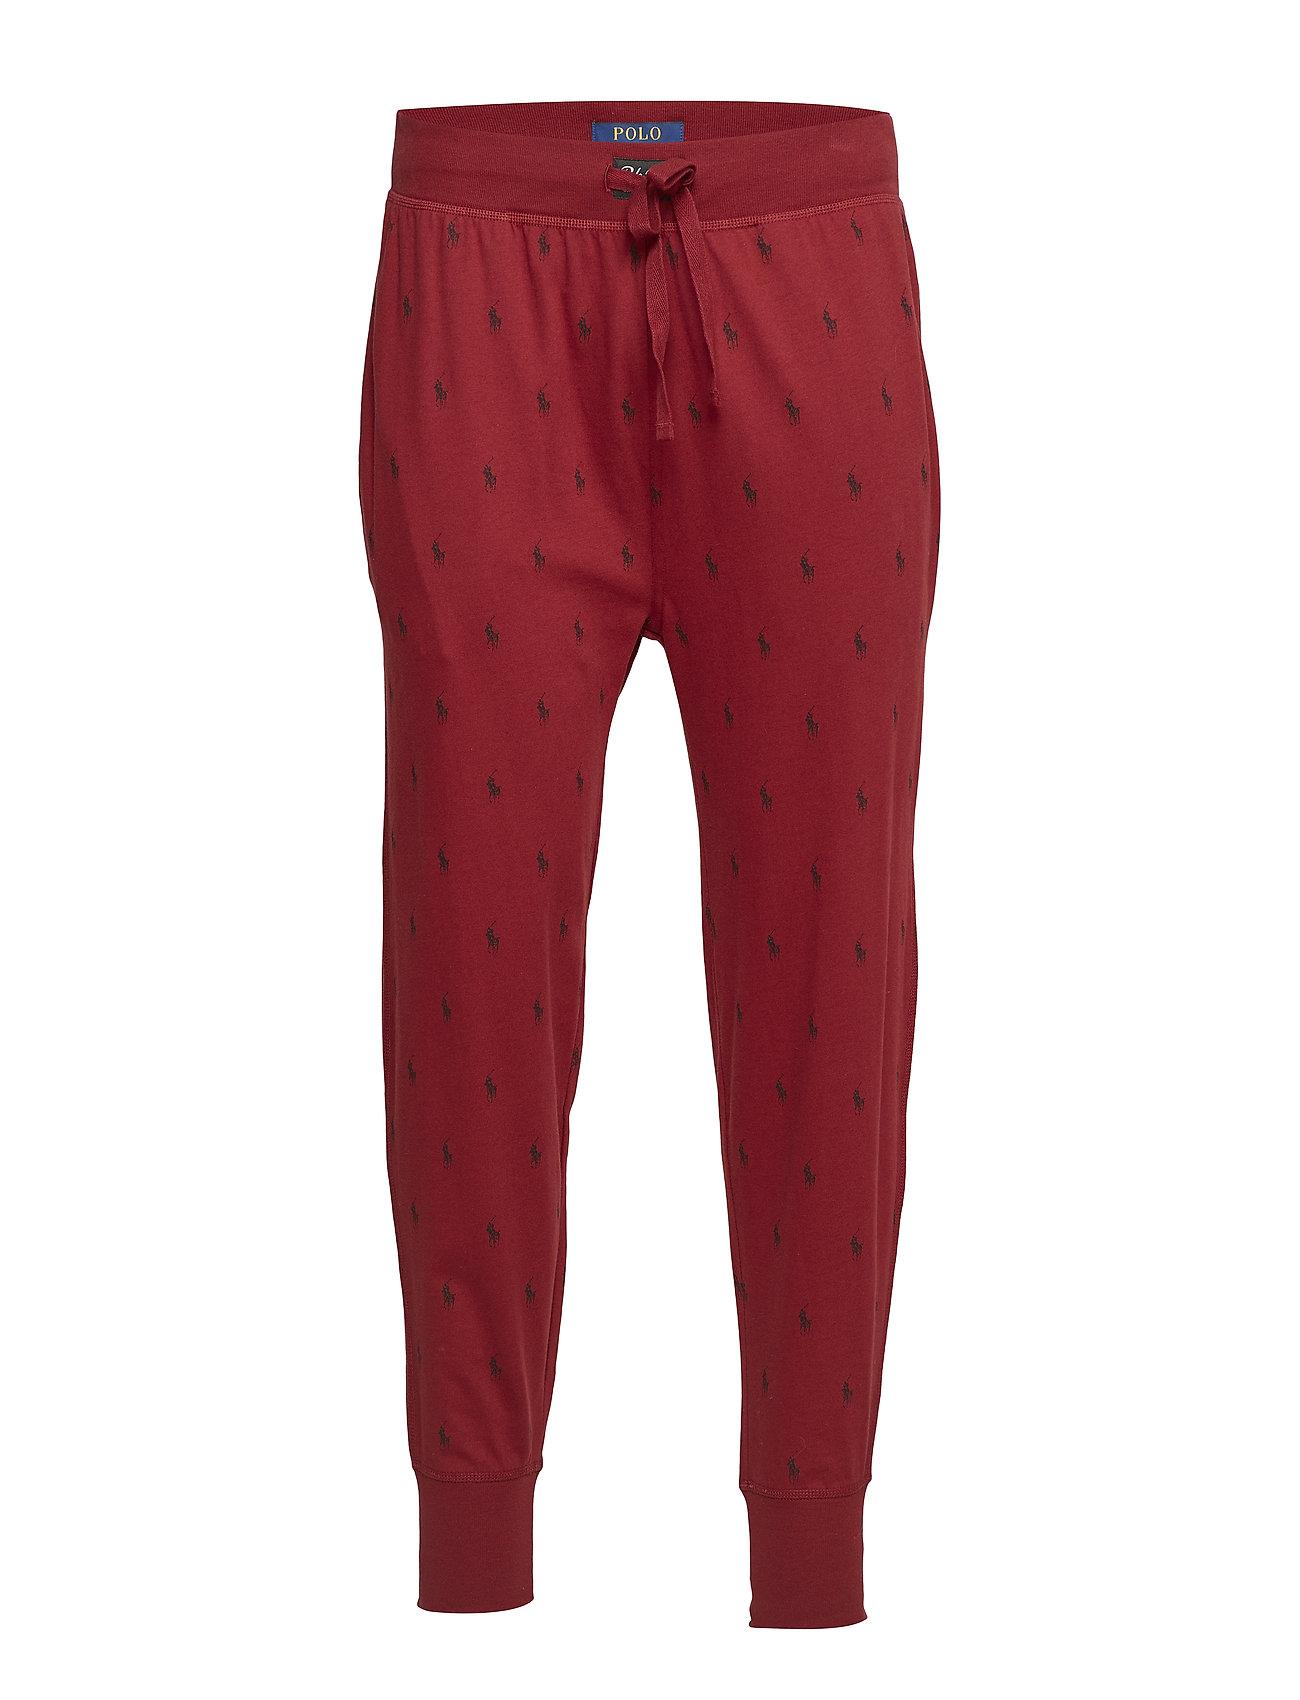 Polo Ralph Lauren Underwear COTTON-GFB-SST - GB BLACK/AOPP BLA